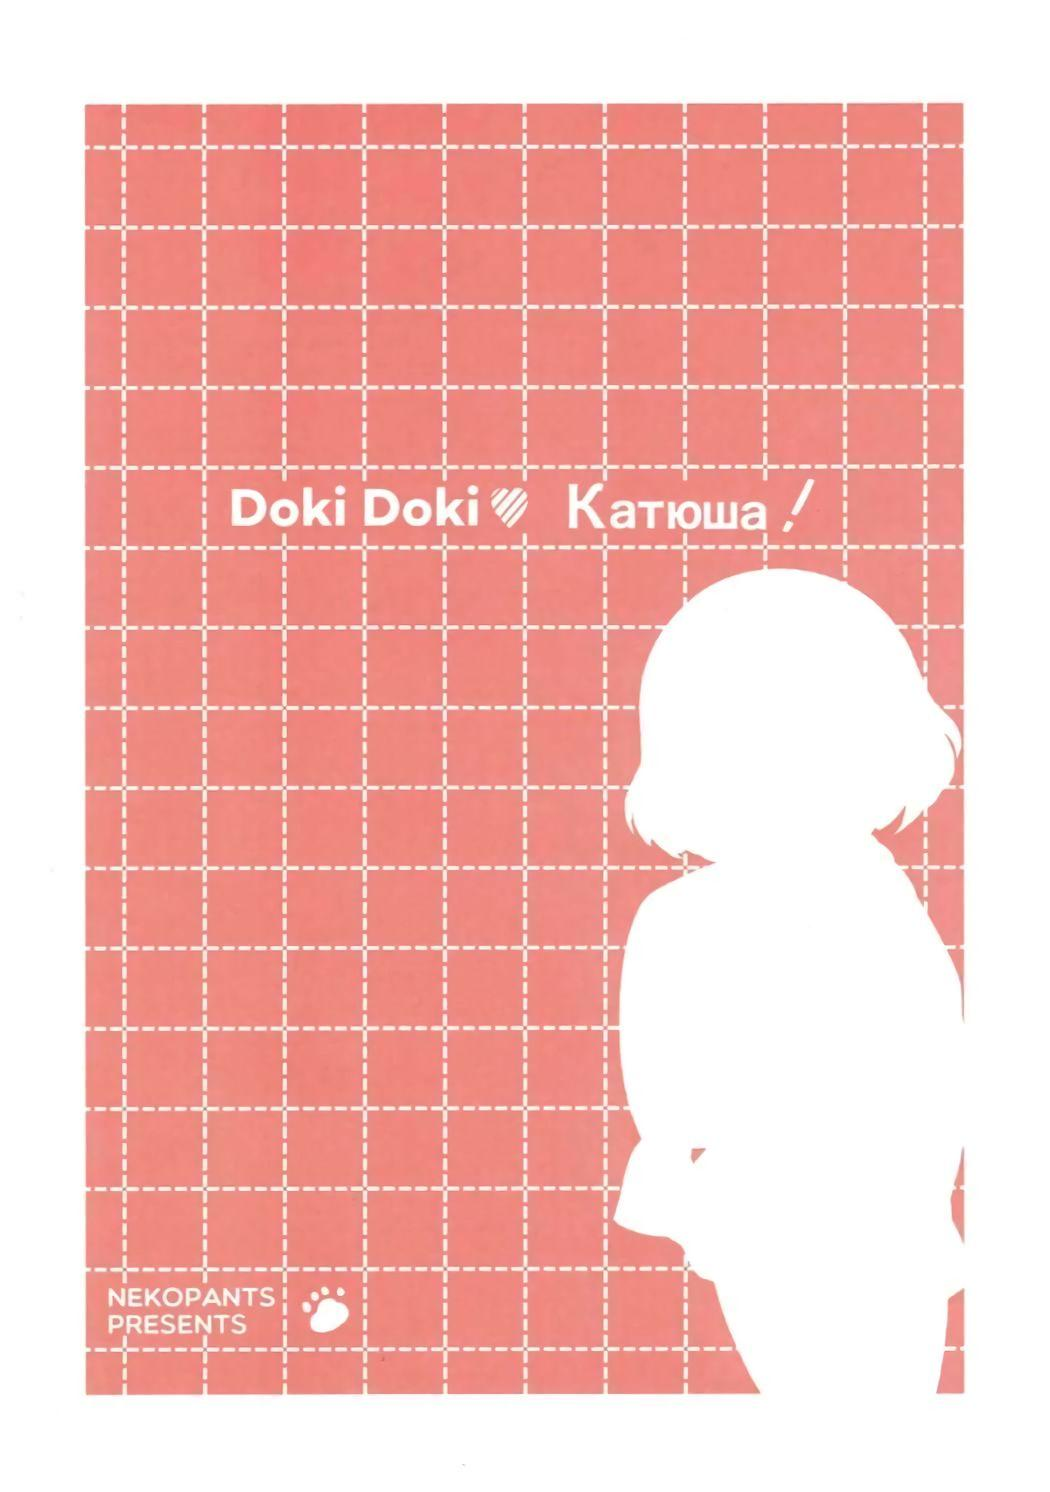 Dokidoki Katyucha! | Heart Pounding Katyusha! 21